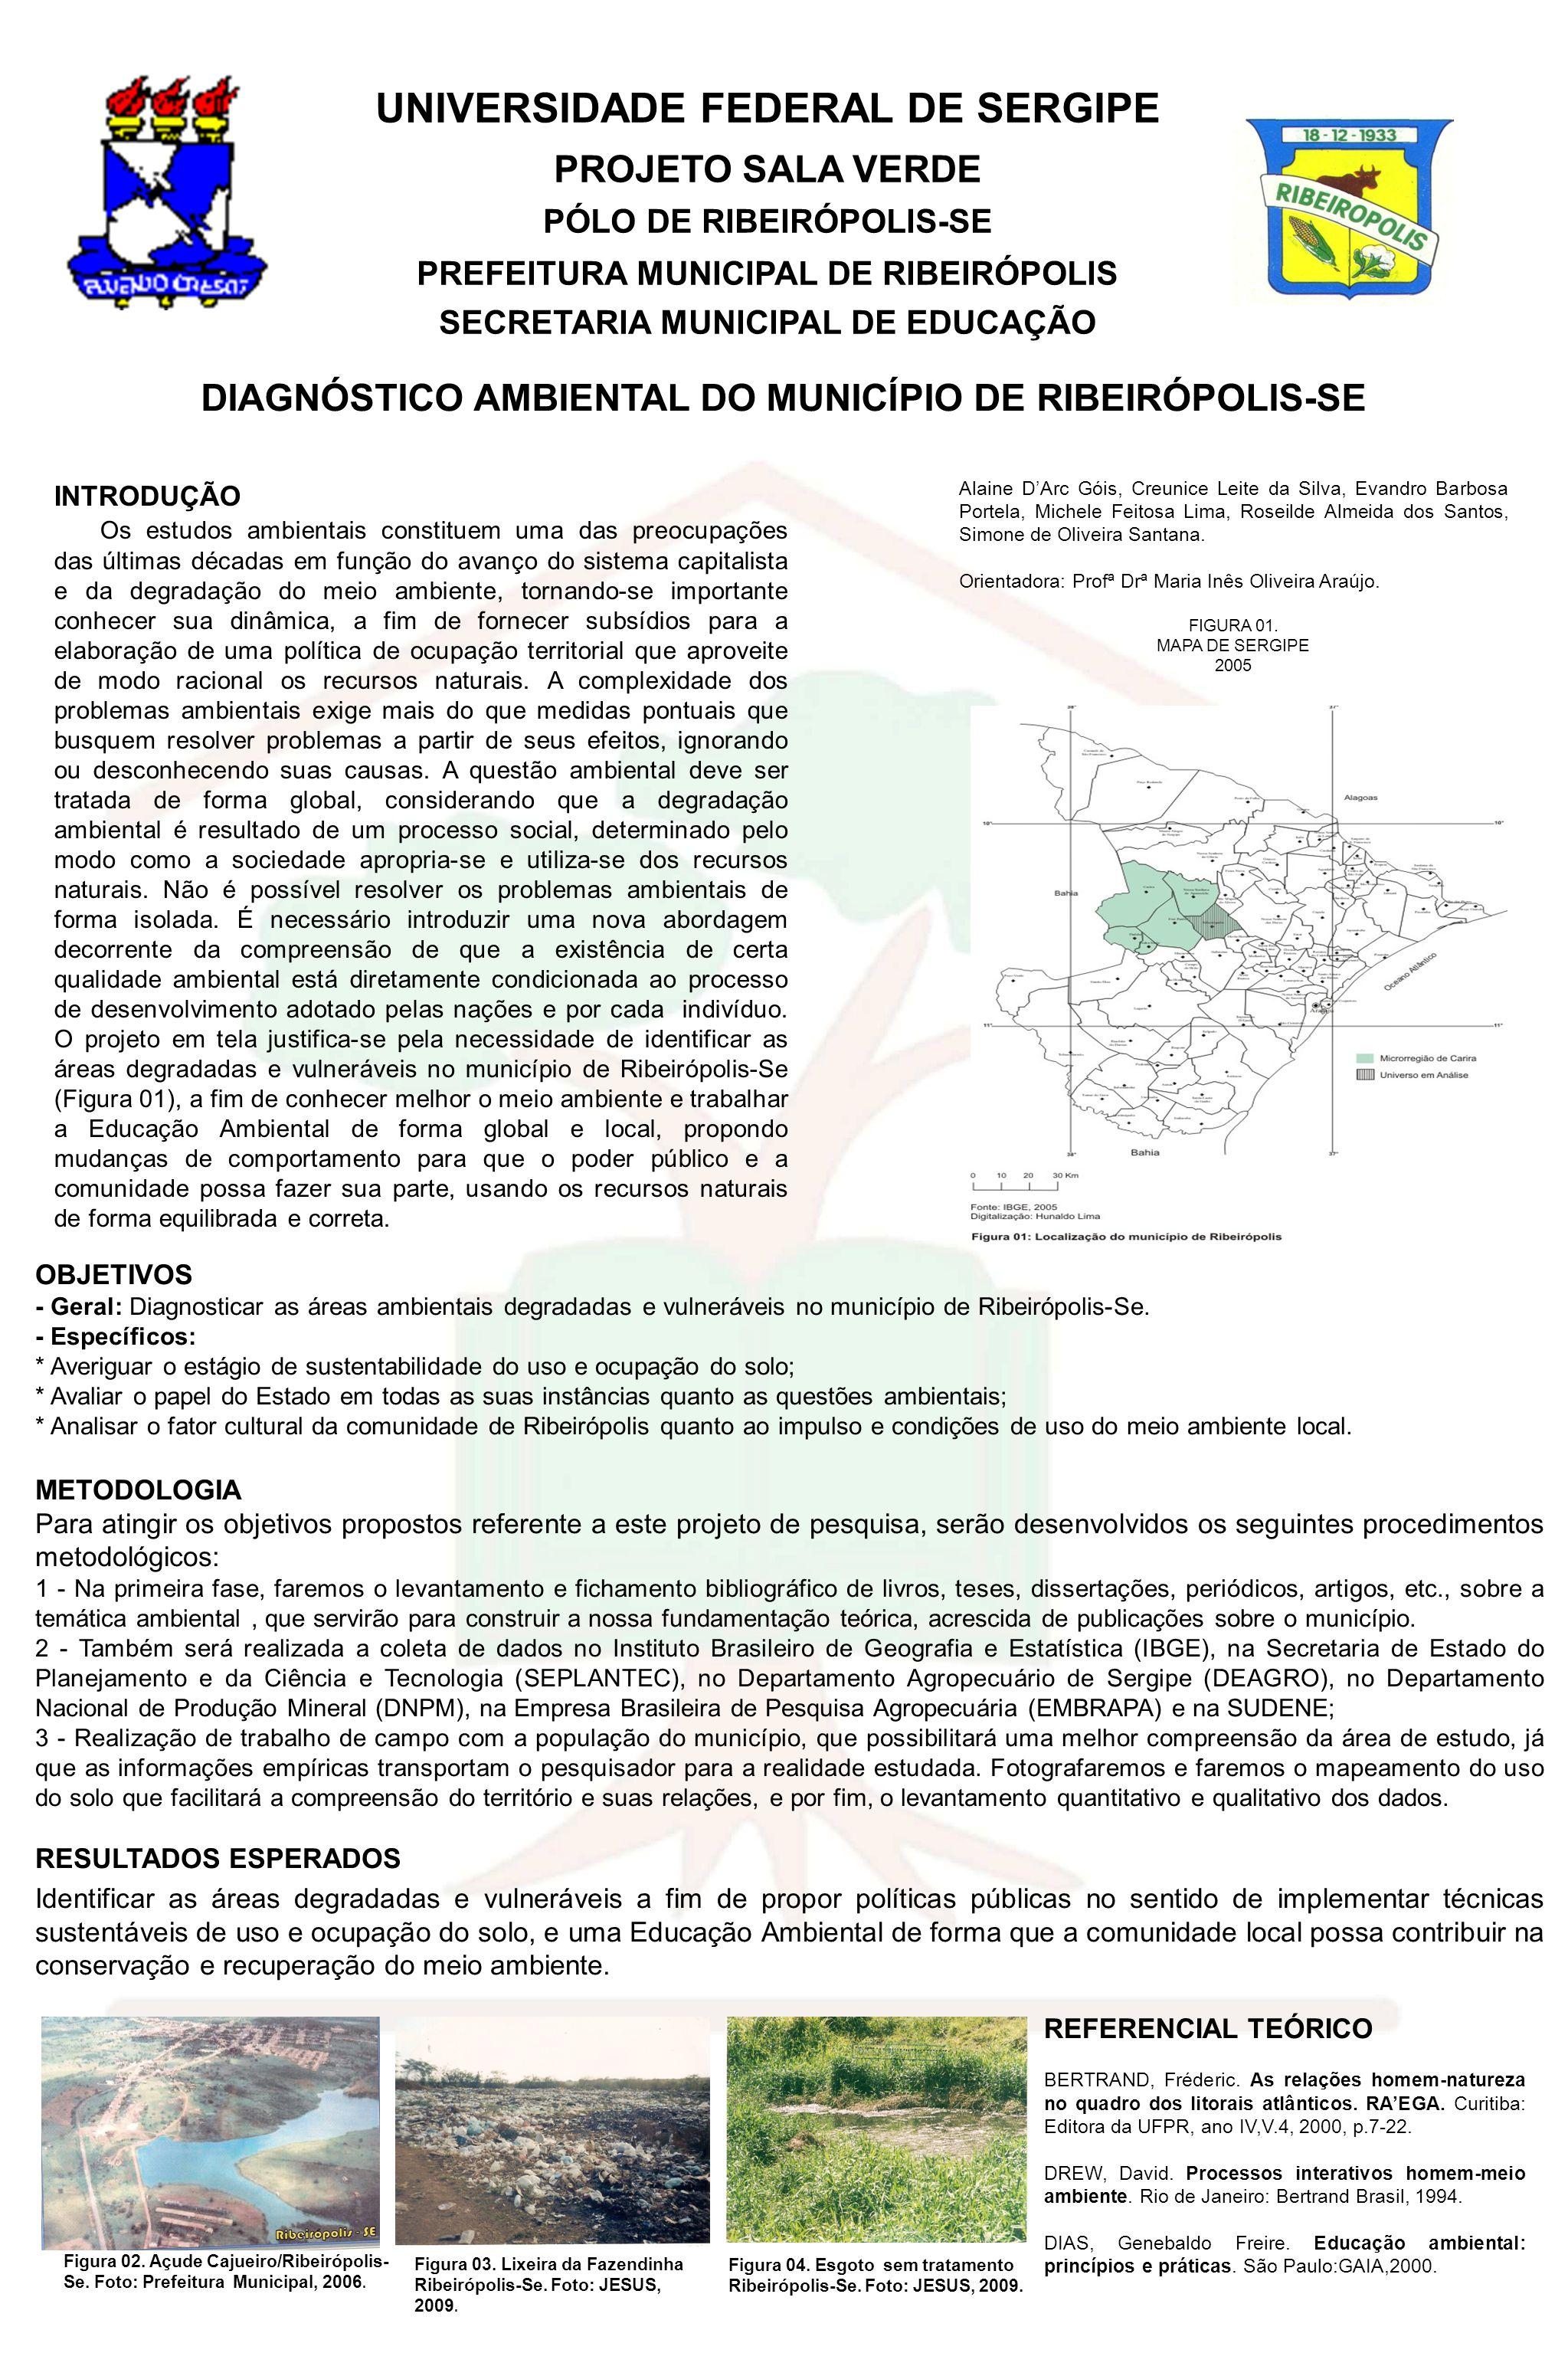 UNIVERSIDADE FEDERAL DE SERGIPE PROJETO SALA VERDE PÓLO DE RIBEIRÓPOLIS-SE PREFEITURA MUNICIPAL DE RIBEIRÓPOLIS SECRETARIA MUNICIPAL DE EDUCAÇÃO DIAGN